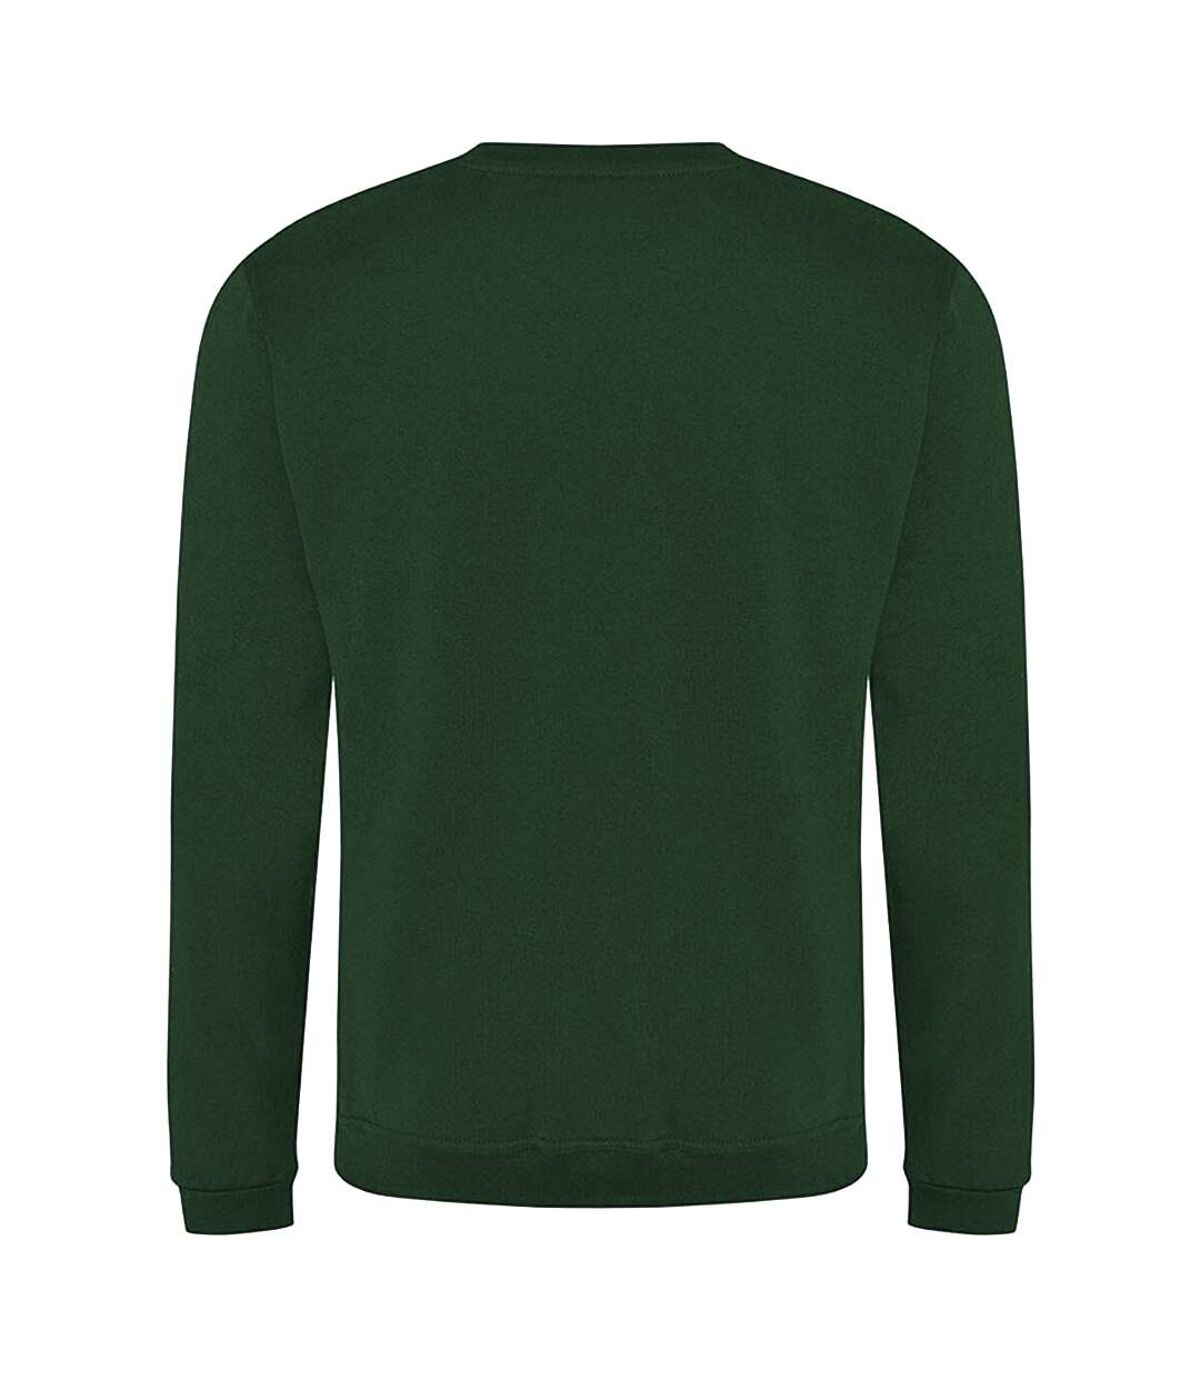 Pro RTX - Sweat-shirt - Homme (Vert bouteille) - UTRW6174